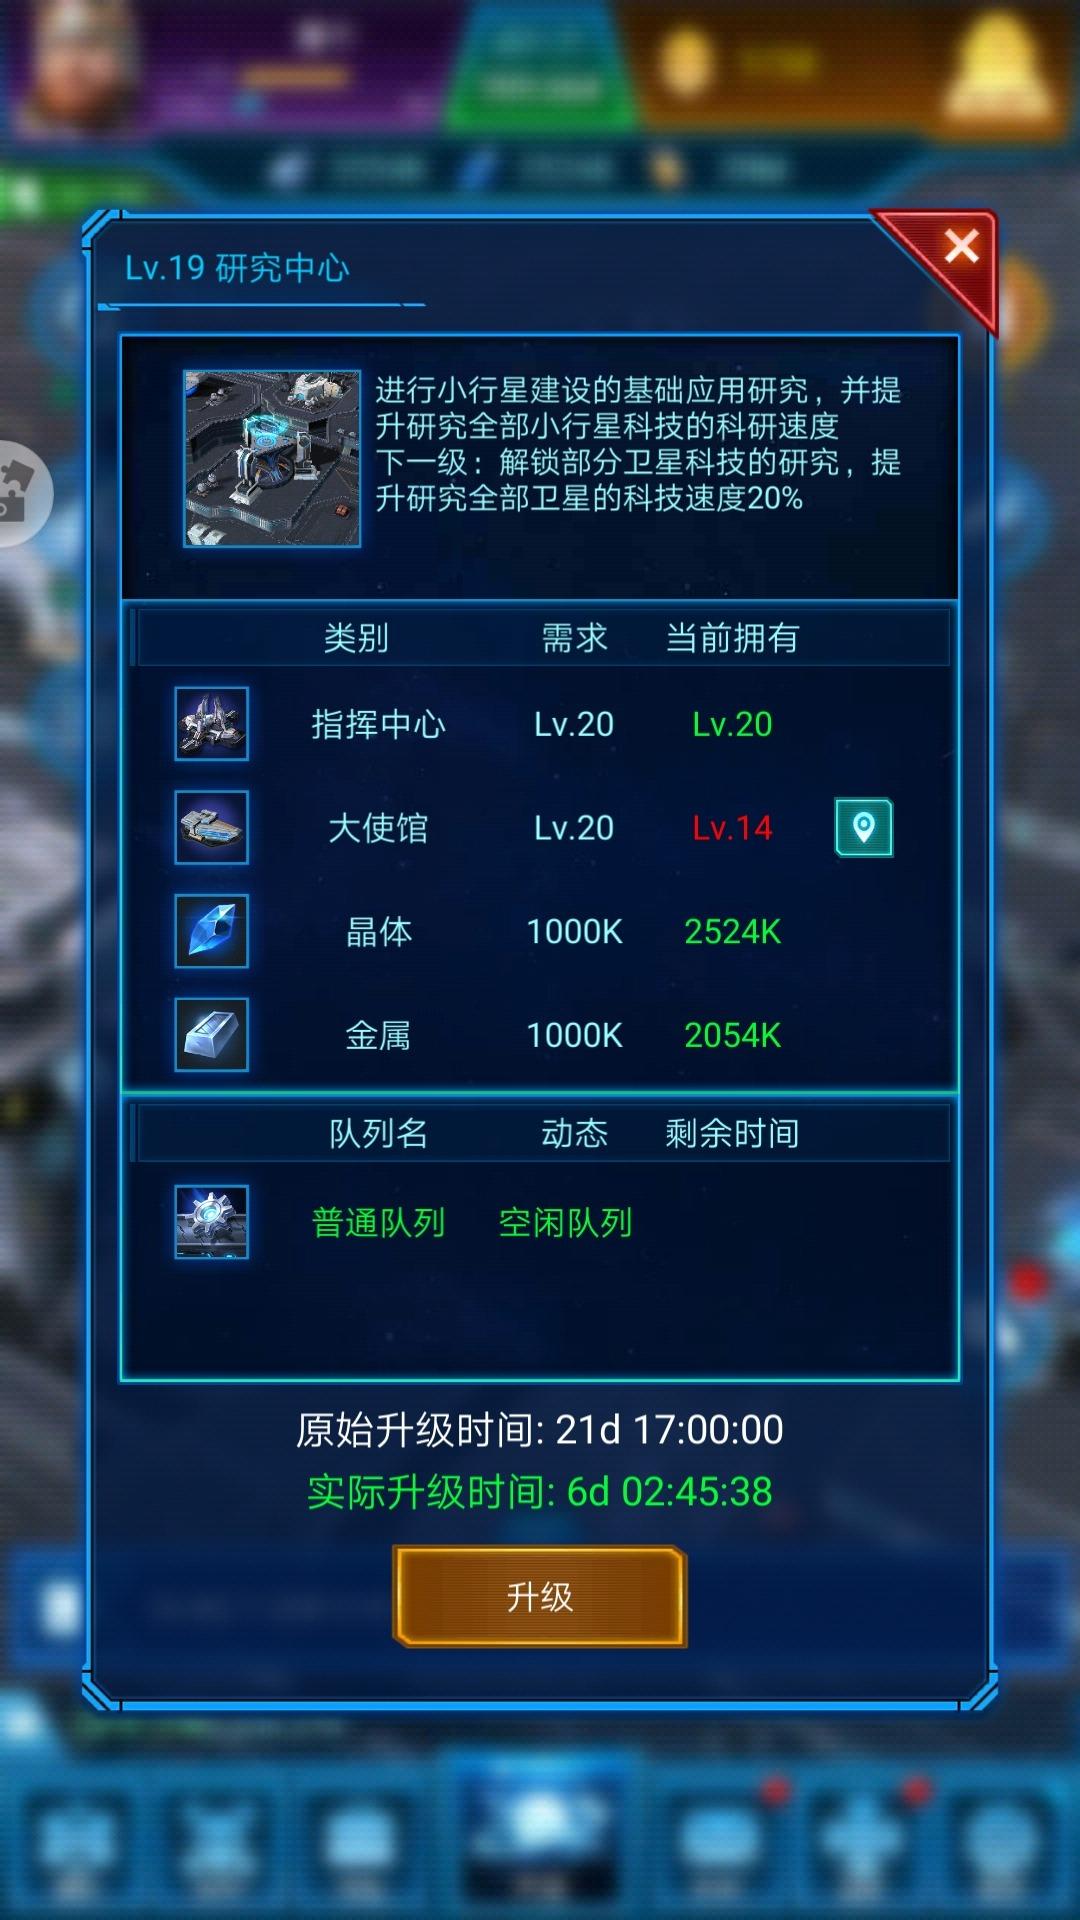 Screenshot_20191113_194206_com.jedigames.p16s.huawei.jpg